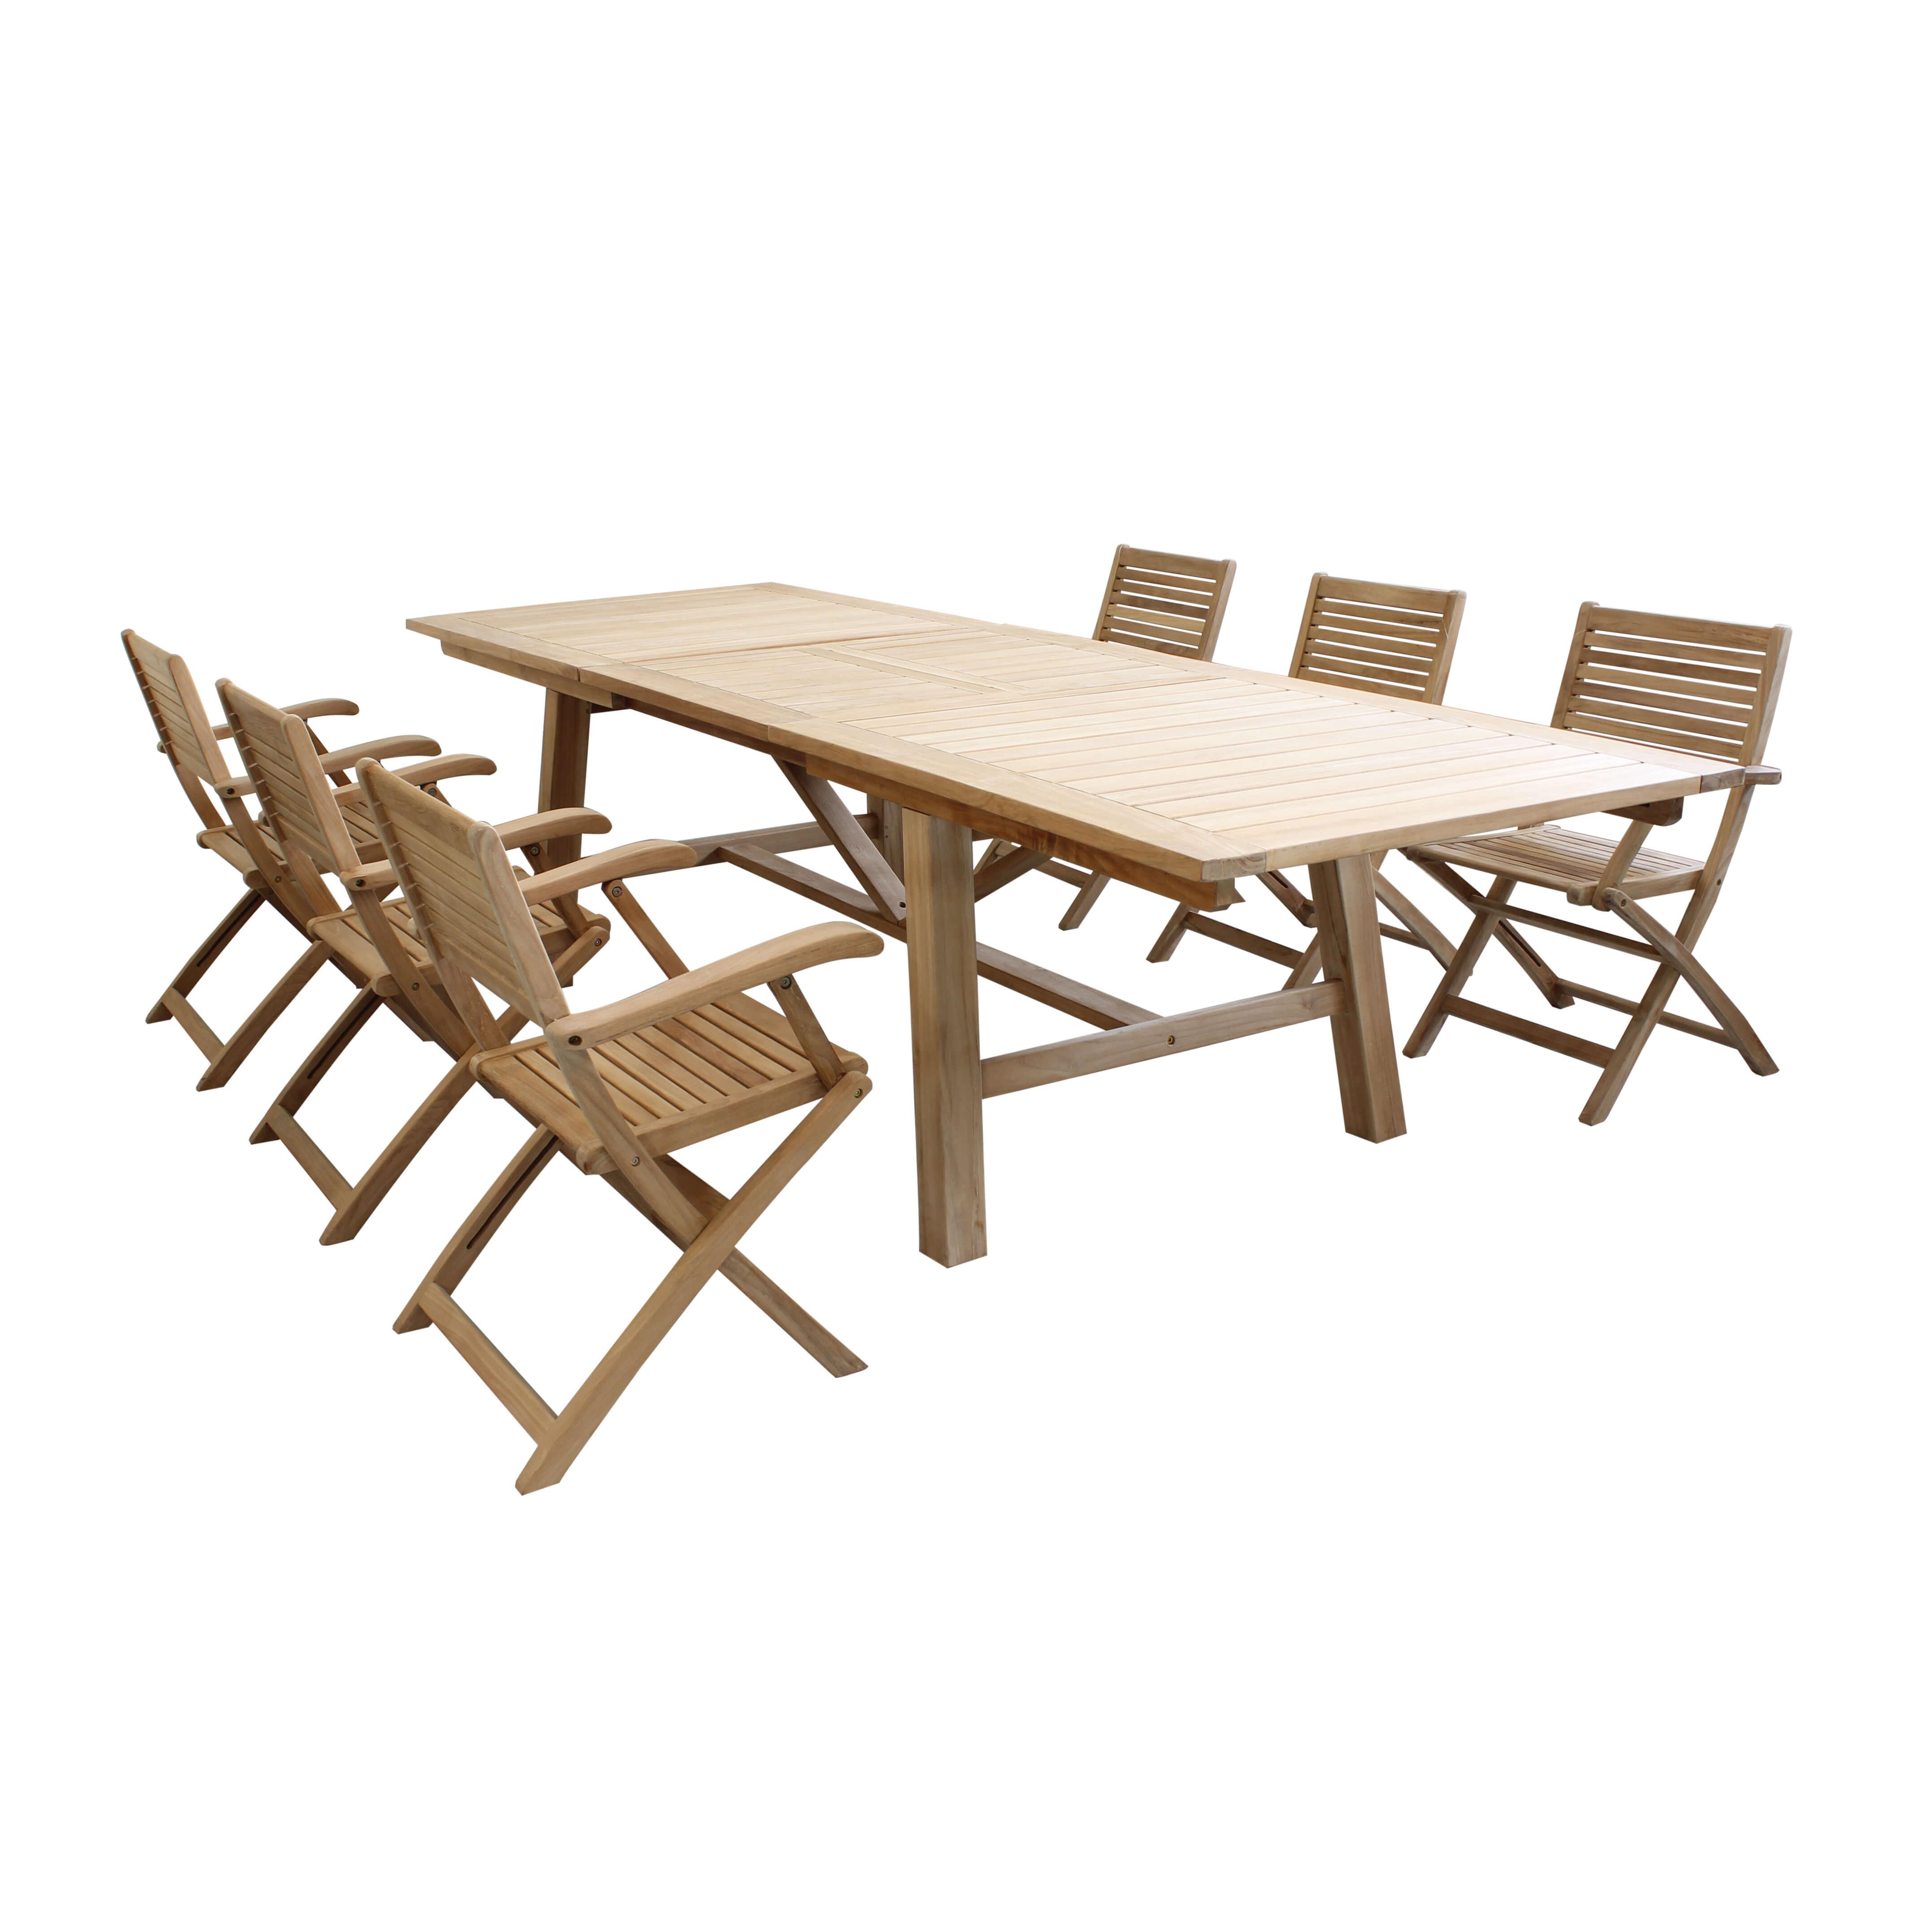 Milani Home ORATOR - set tavolo in teak cm.220/300 x 100 x 77 h con 6 sedute